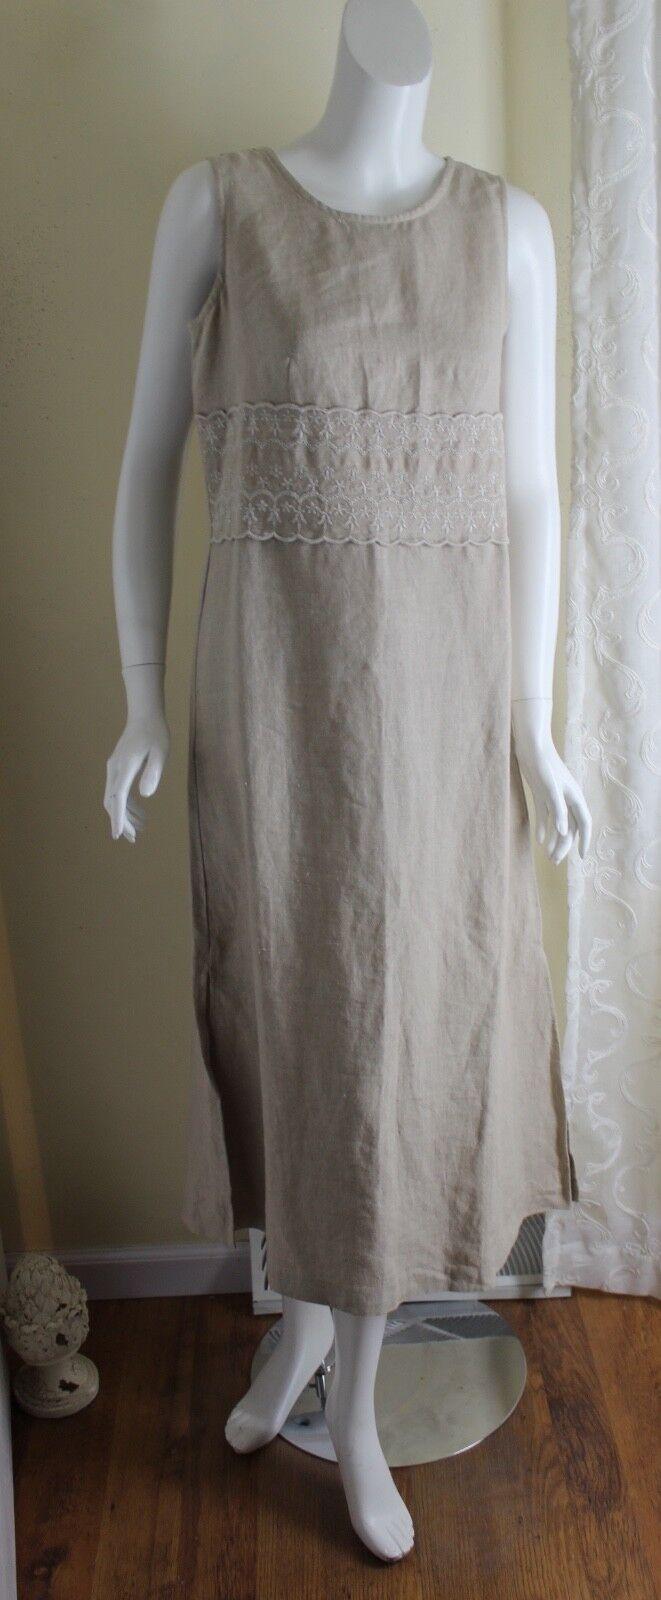 Eileen West Sz 12 12 12 Natural Long Linen Lace Fab French Romantic Lagenlook Dress 87d6c0